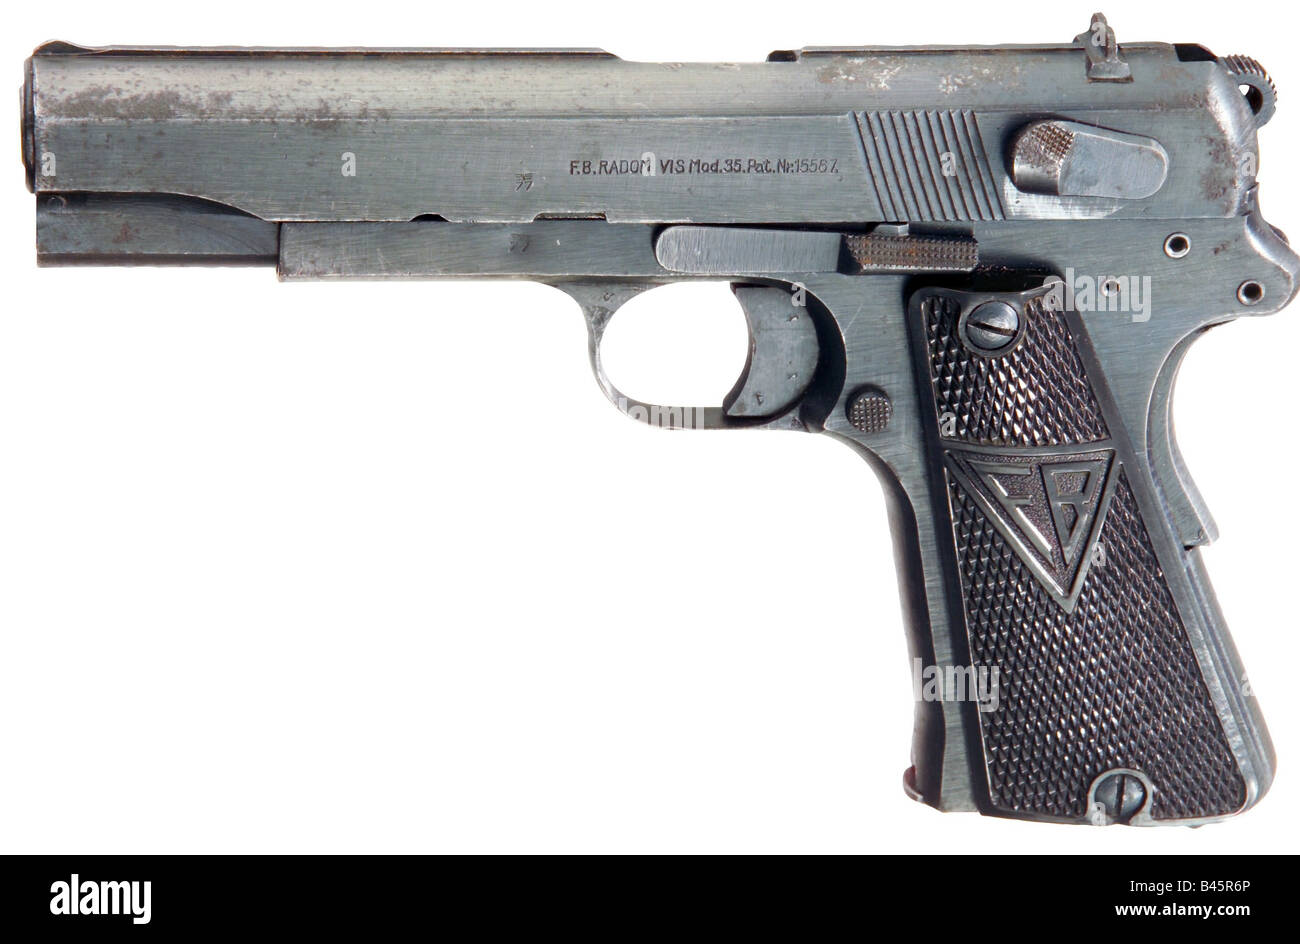 Star Firearms : B-Series Pistols